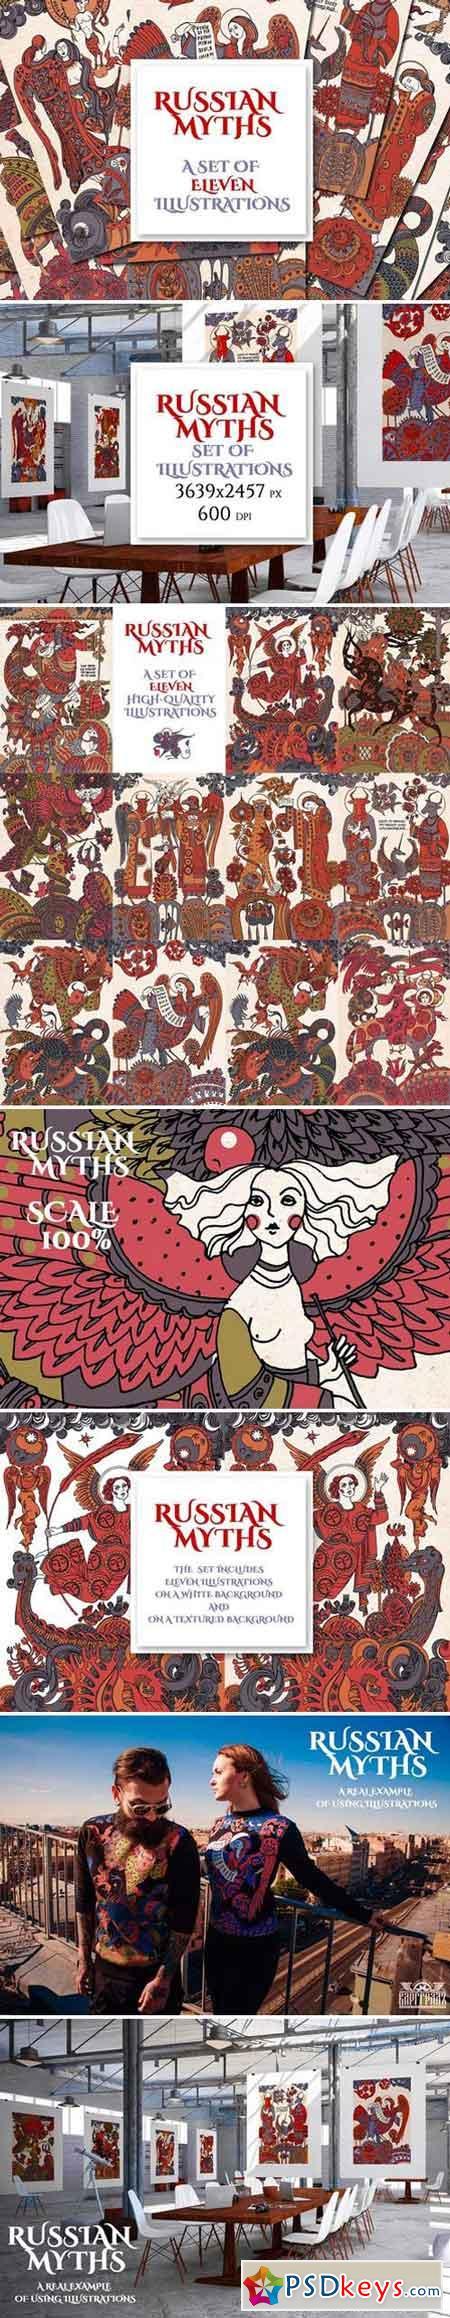 Russian Myths 2204746